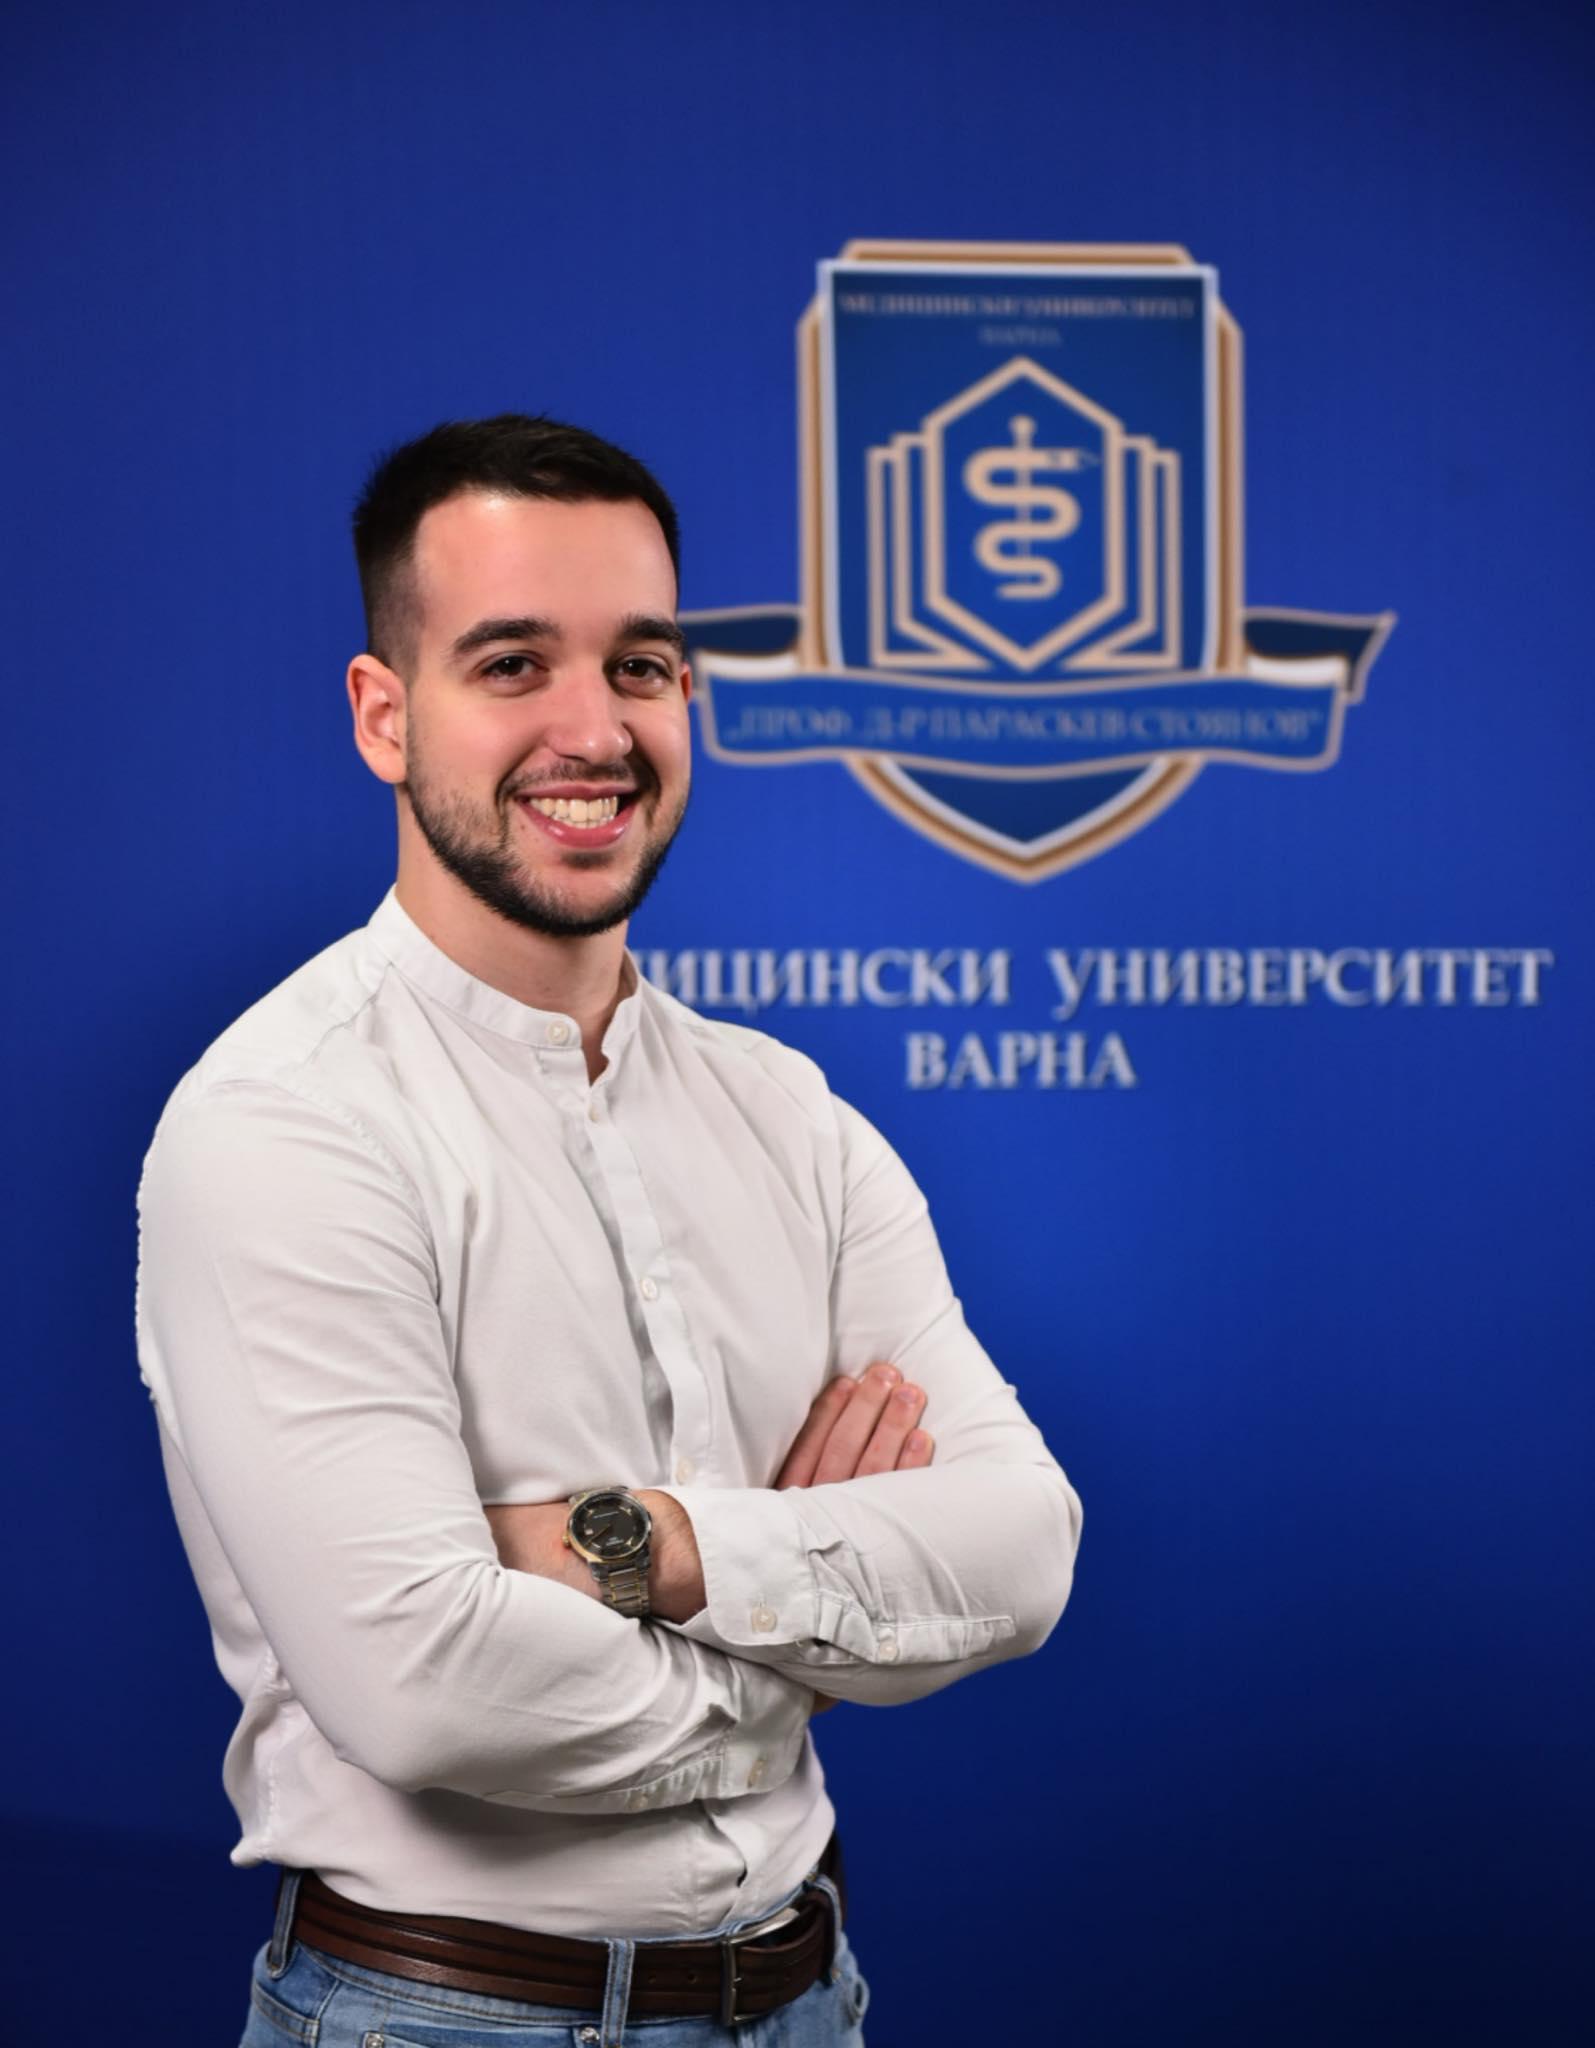 Светослав Стоянов